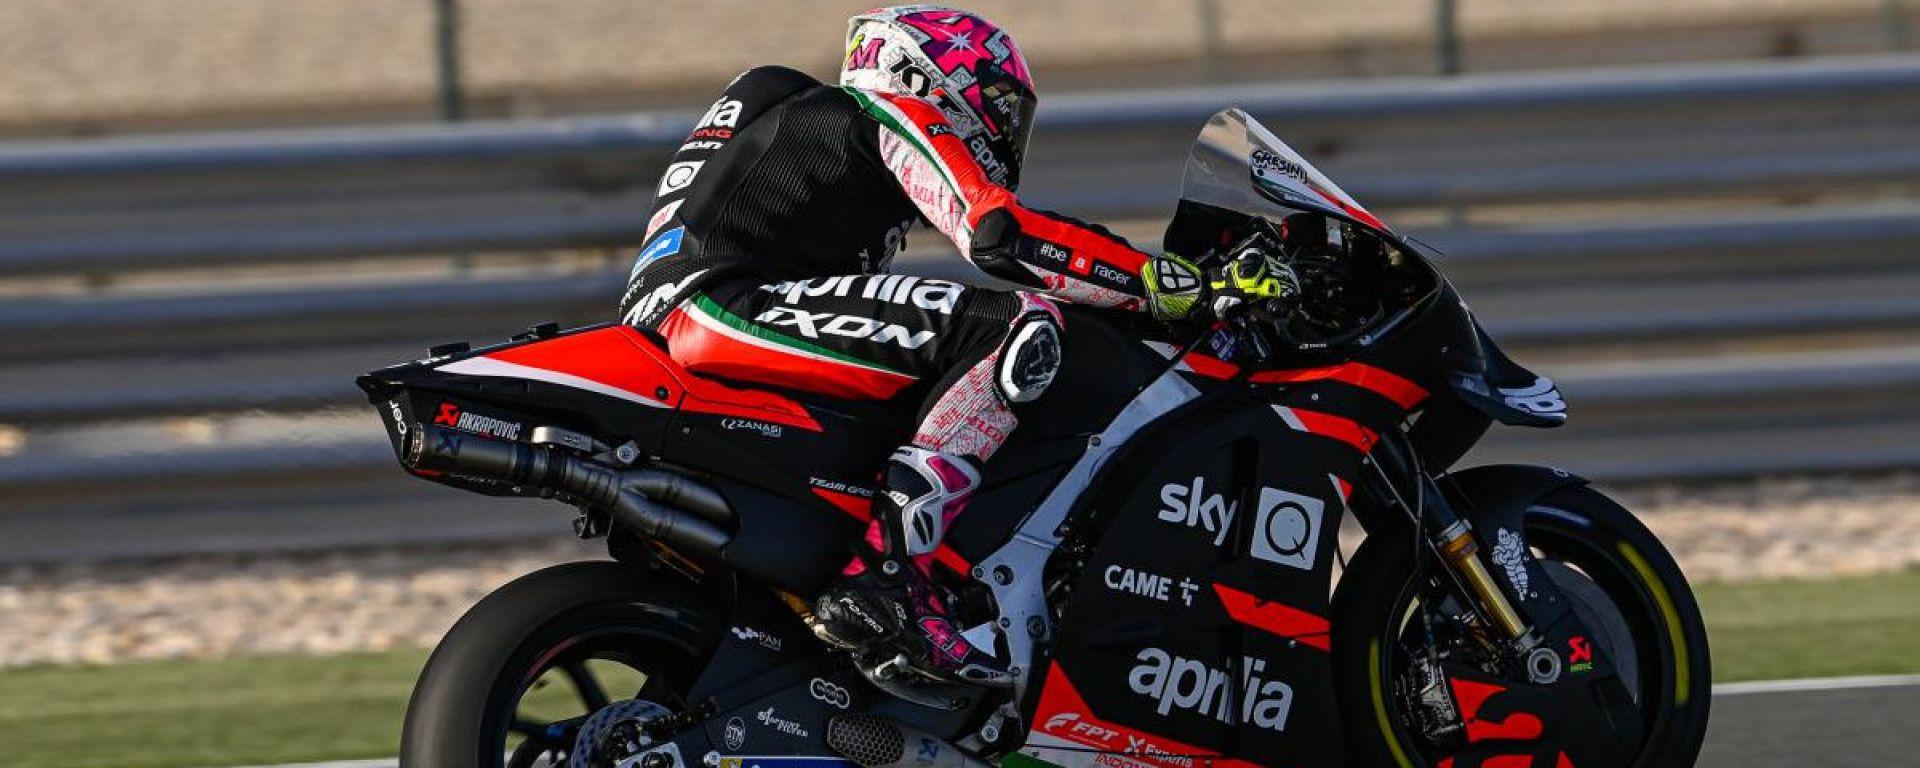 GP Doha 2021, Losail: Aleix Espargaro (Aprilia)